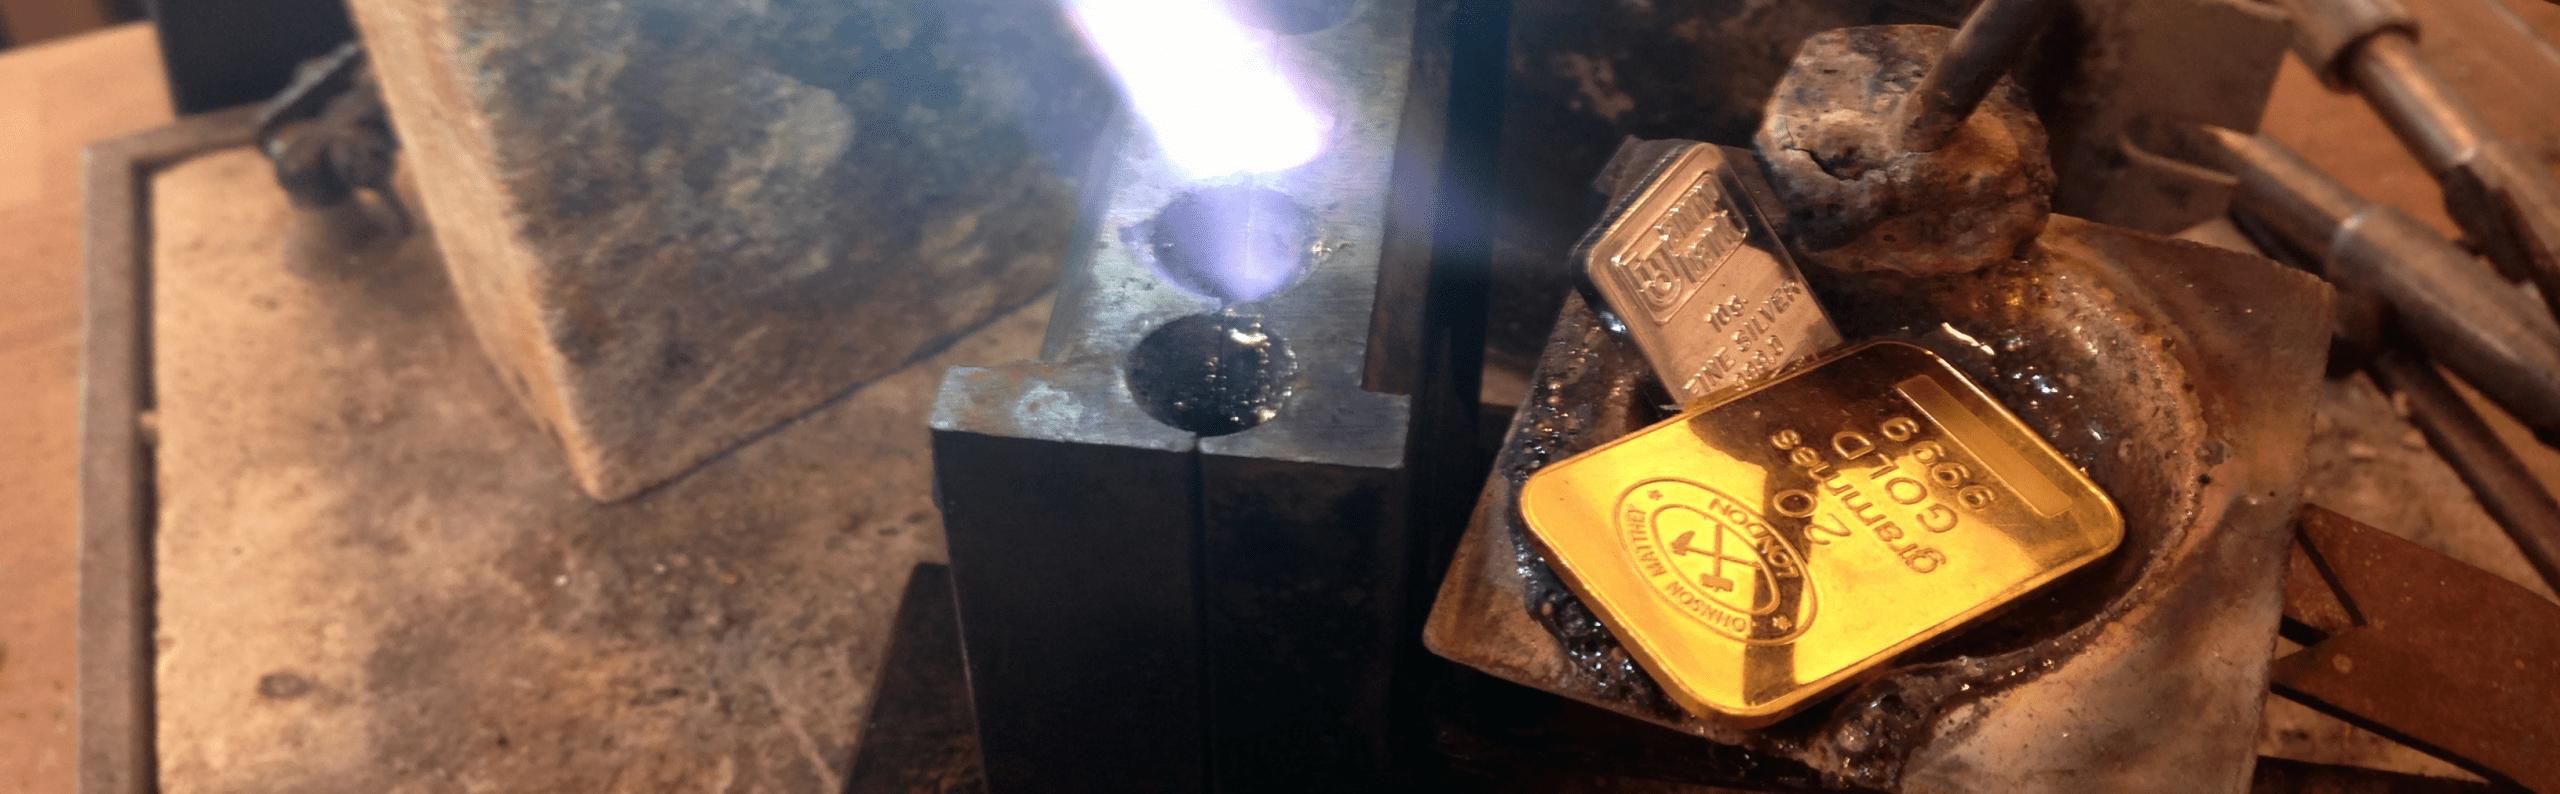 goud-zilver-legeren-smelten-edelsmeden-cursus